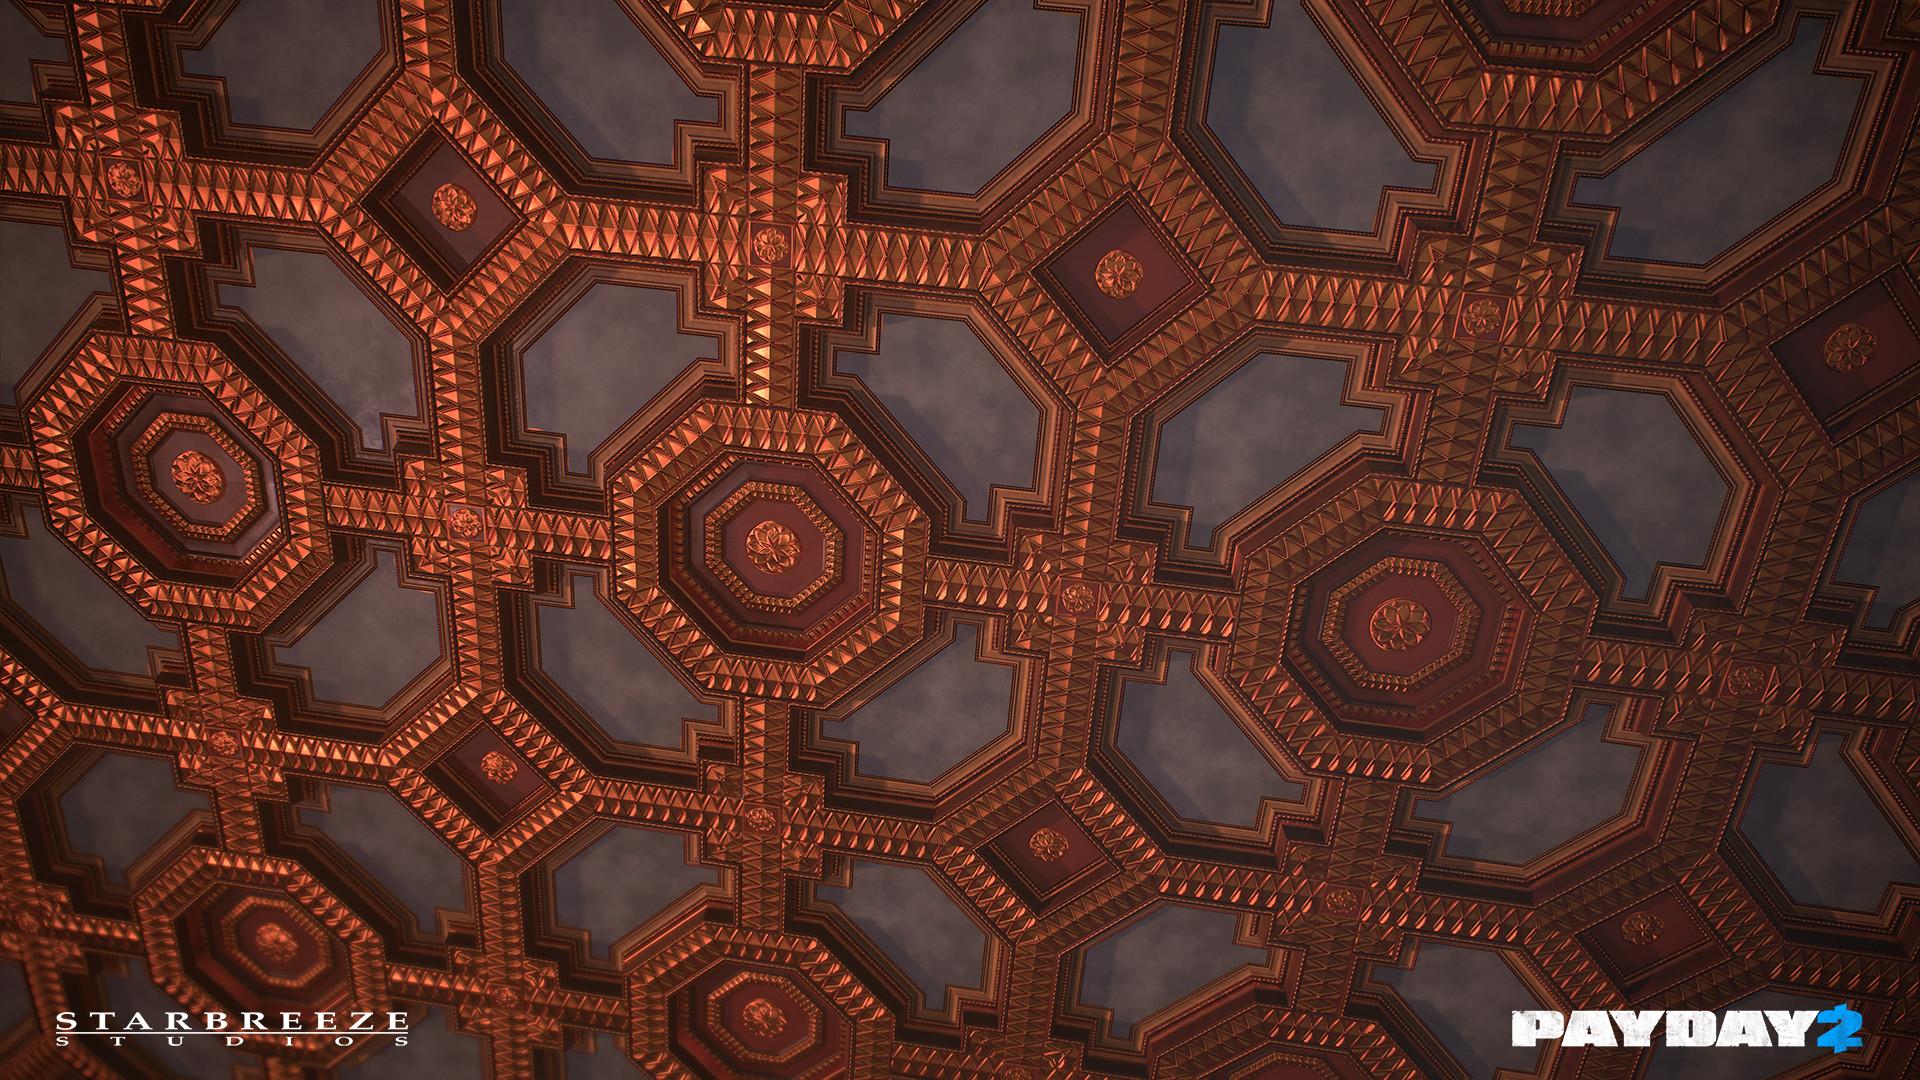 Lucas josefsson lucasjosefssonpayday2 ceiling 3